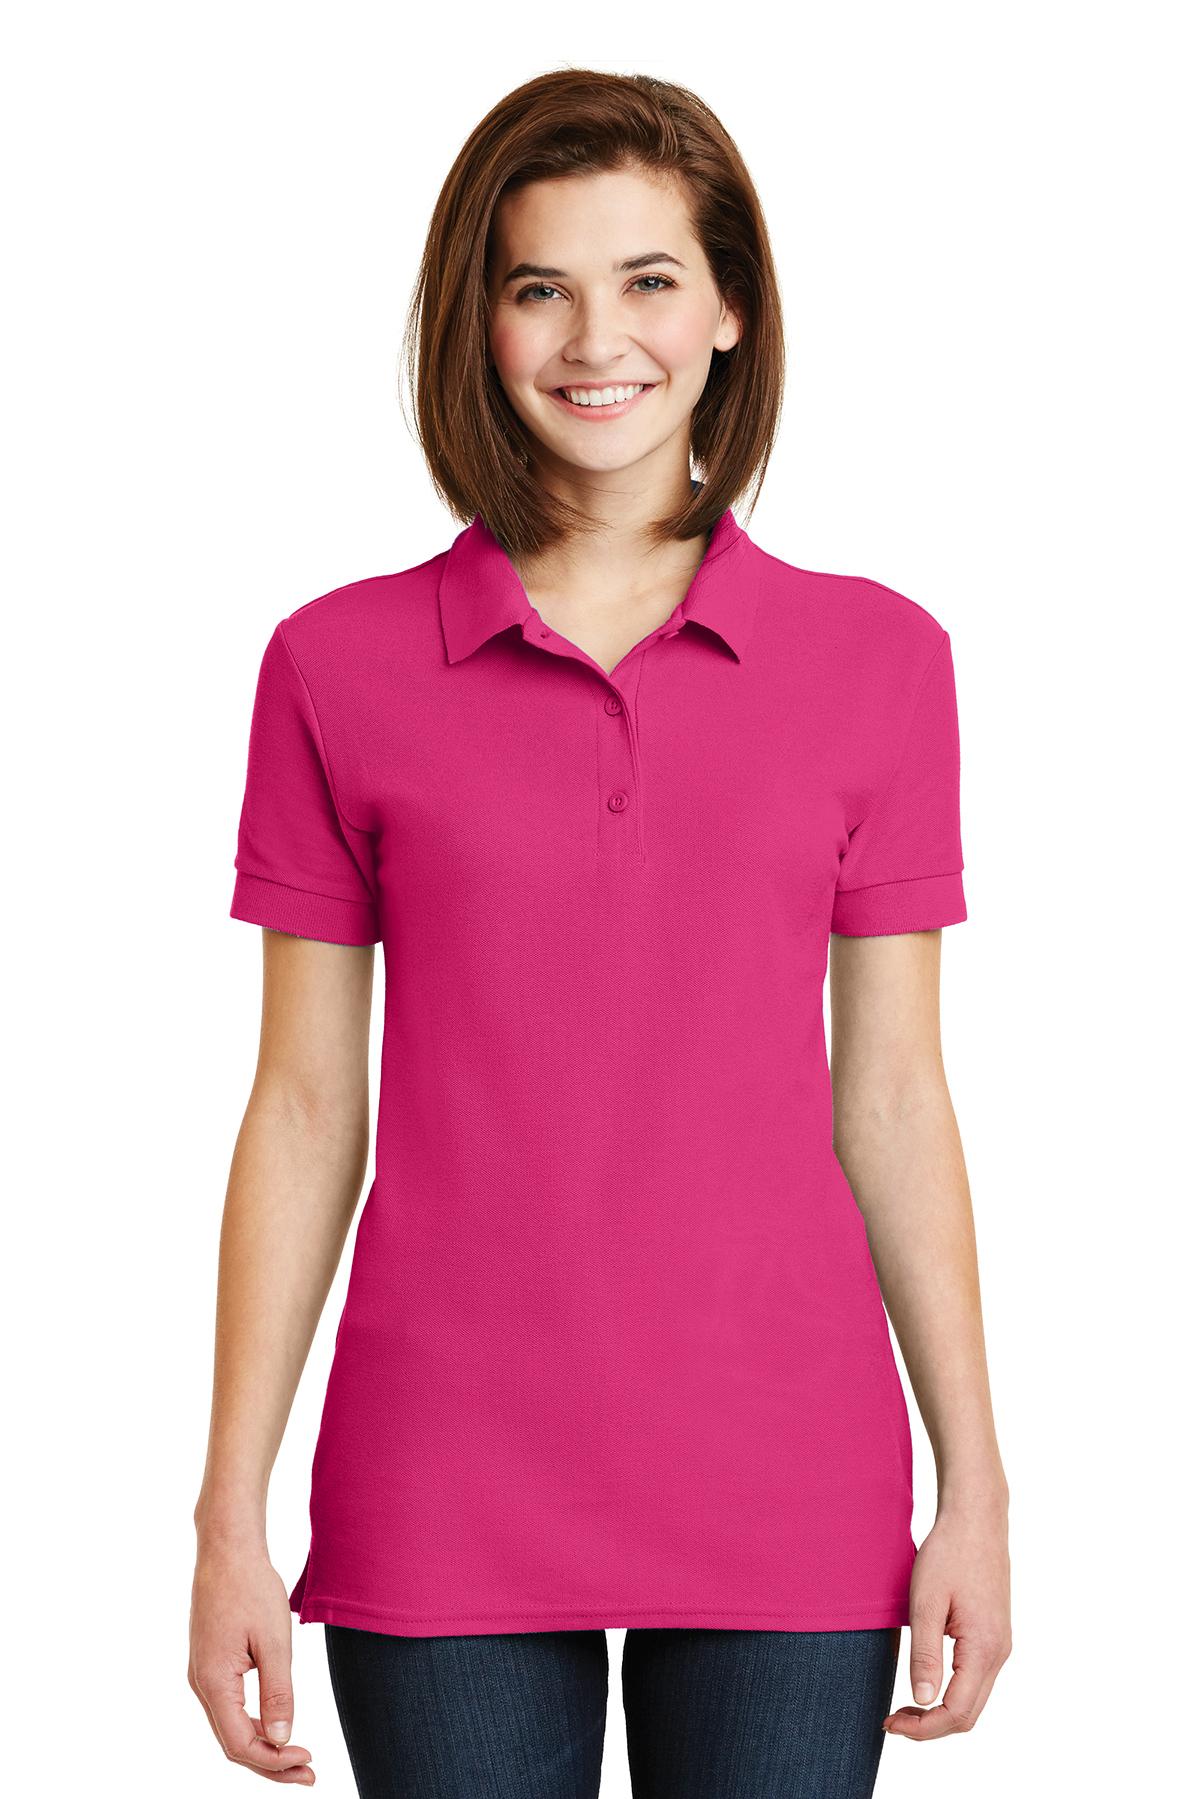 5 Pack Gildan Ladies 100/% Ringspun Premium Cotton Double Piqué Polo shirt Womens